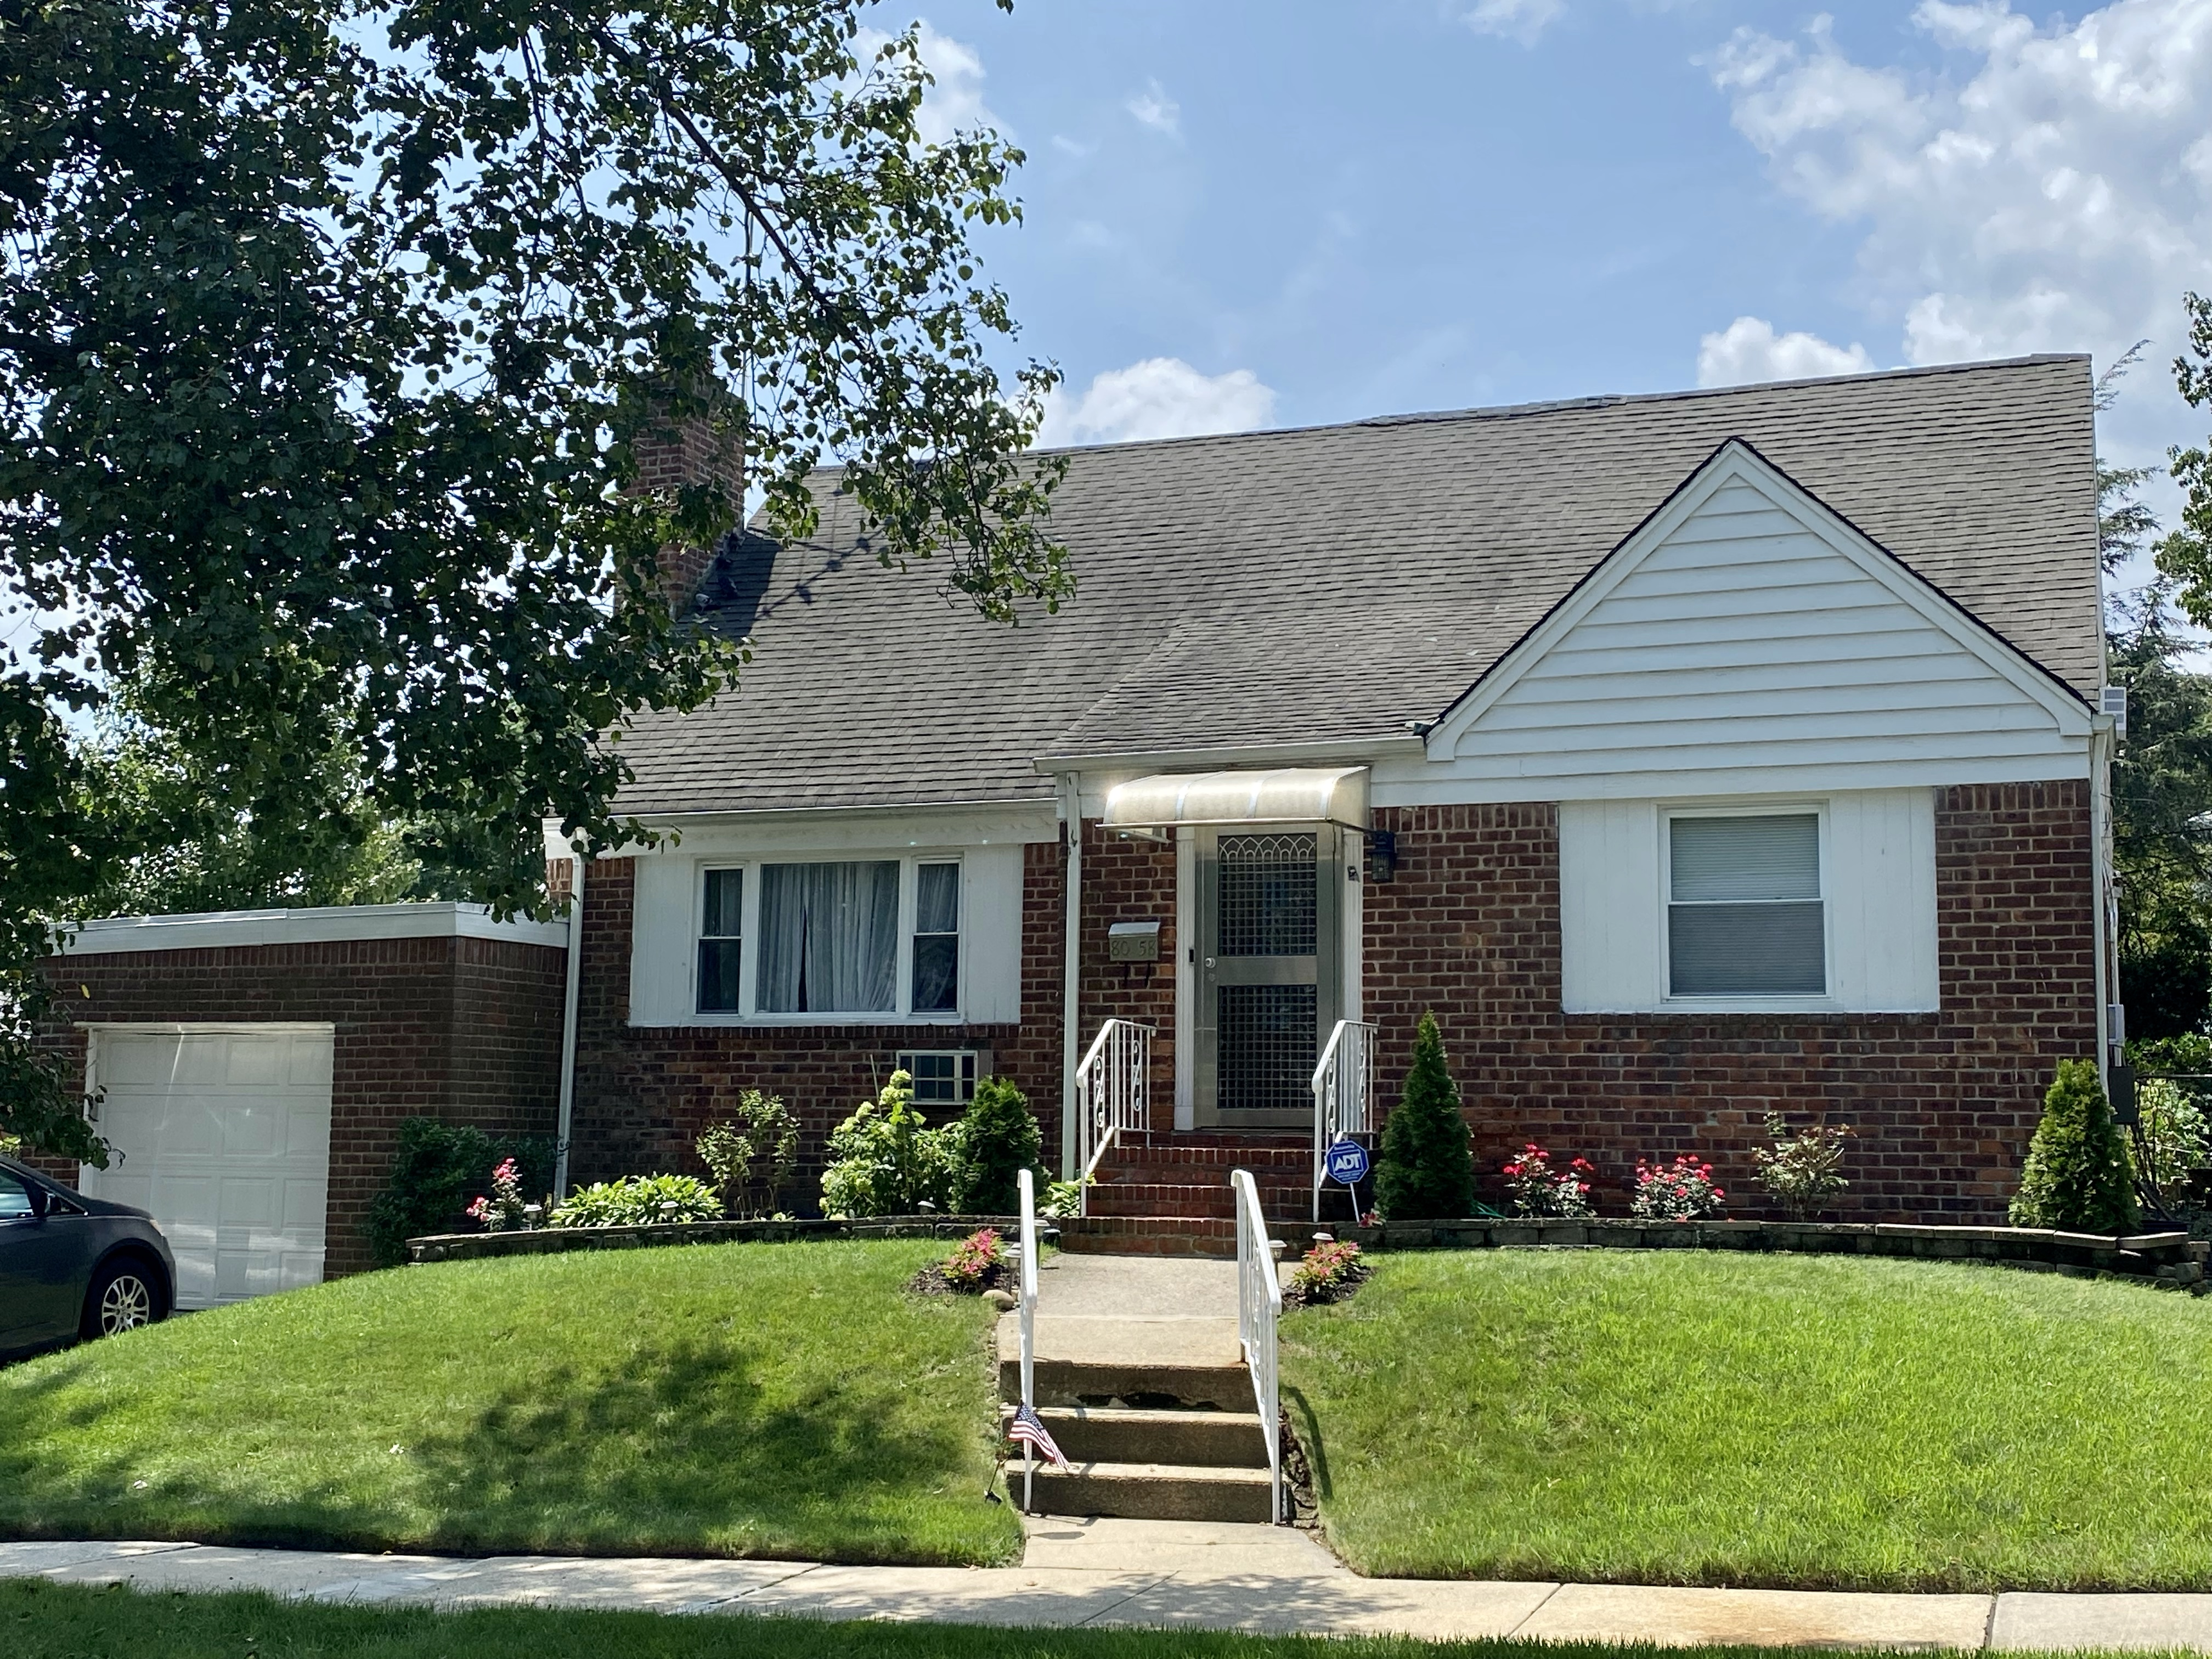 Single-family home for sale in Bellerose Manor